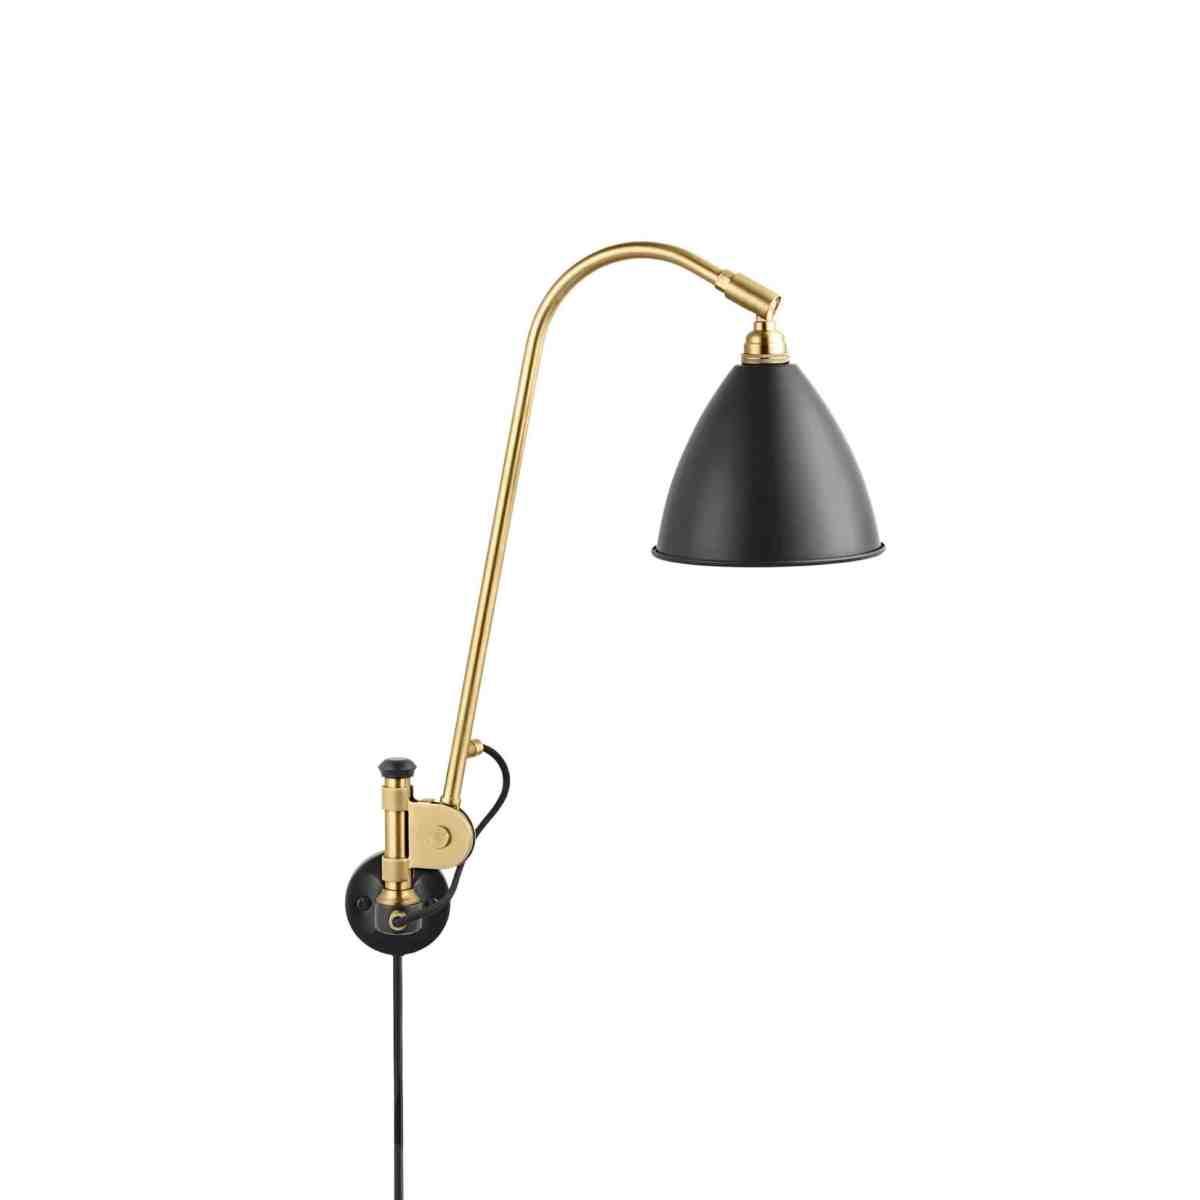 gubi-bestlite-wall-lamp-BL6-charcoal-black-brass-01